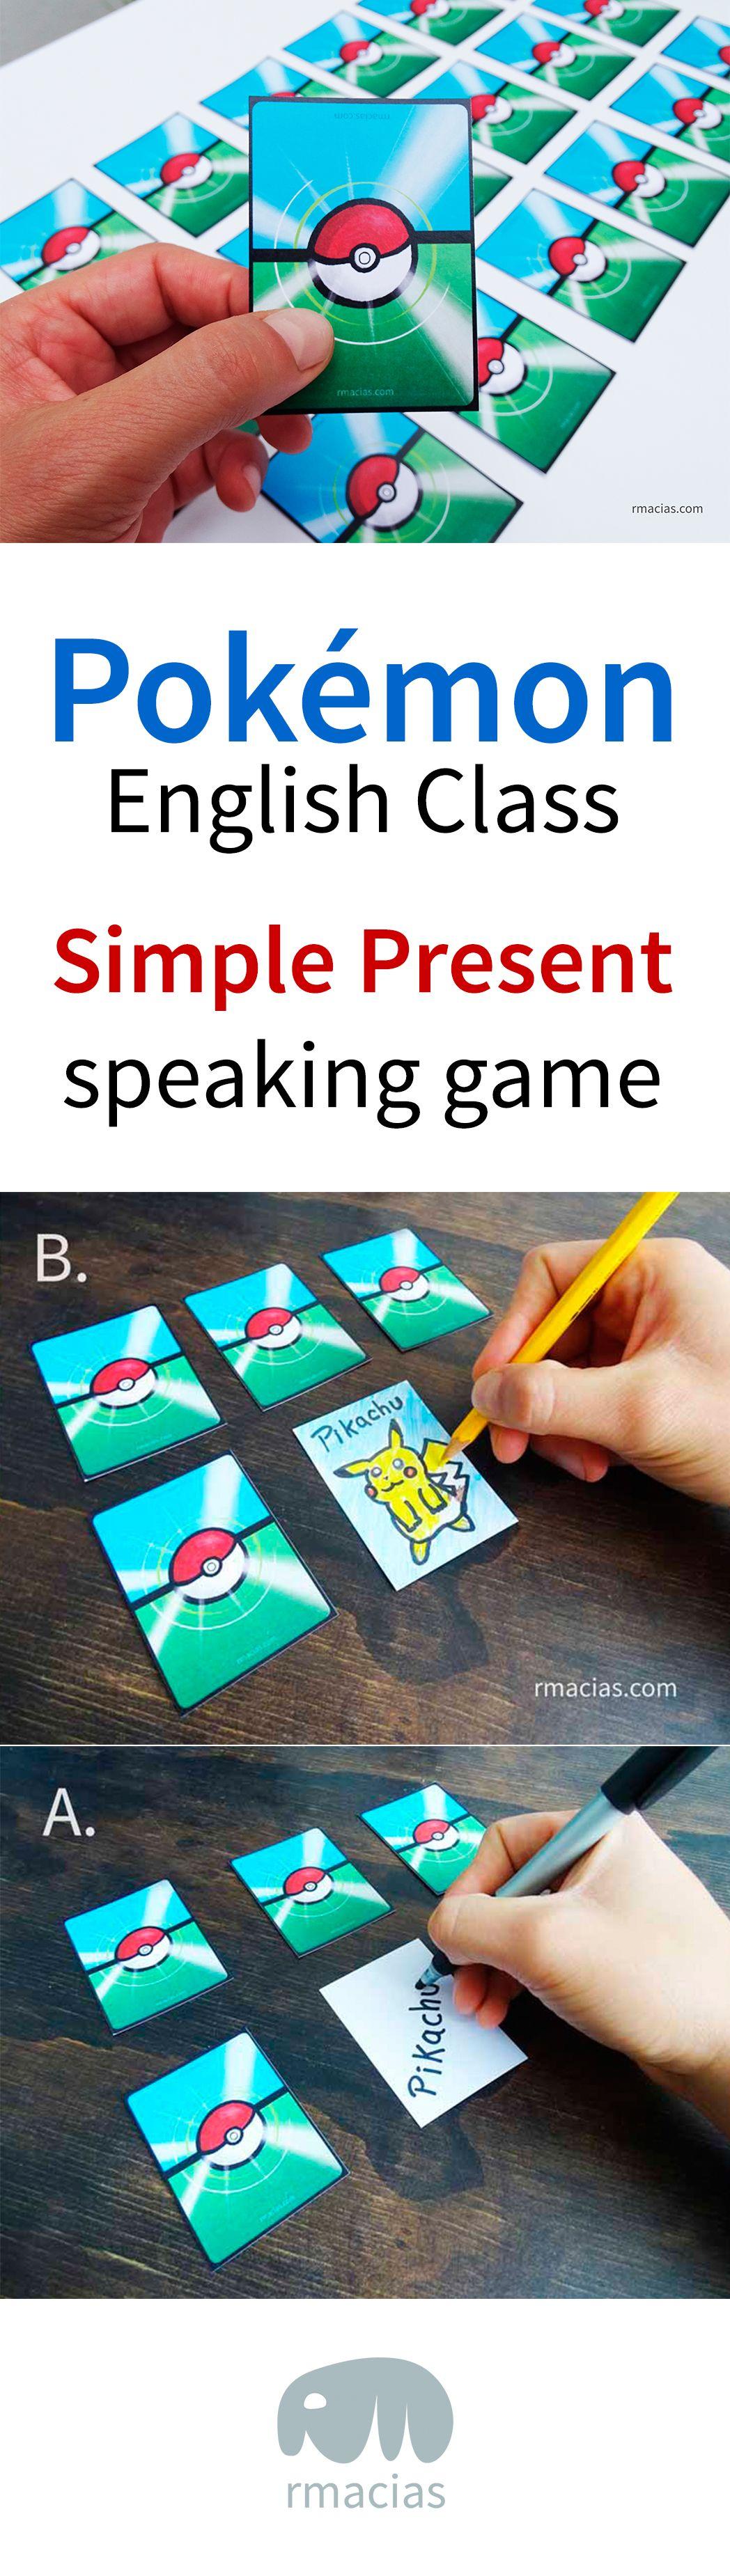 Pokemon Classroom Game For Teaching Kids English Simple